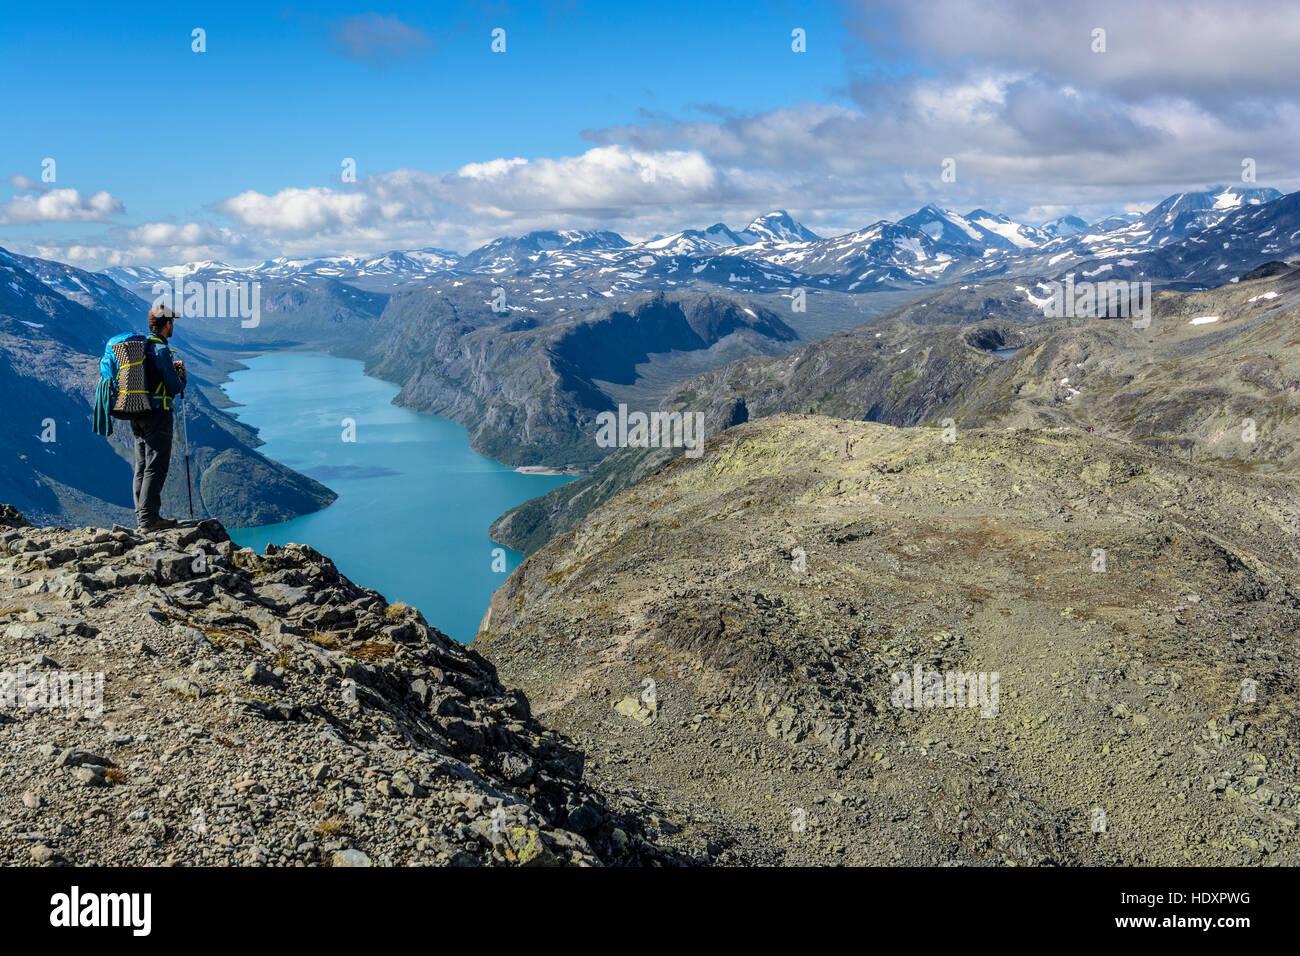 Hiker on the Besseggen ridge overlooking Gjende lake, Jotunheimen National Park, Norway - Stock Image